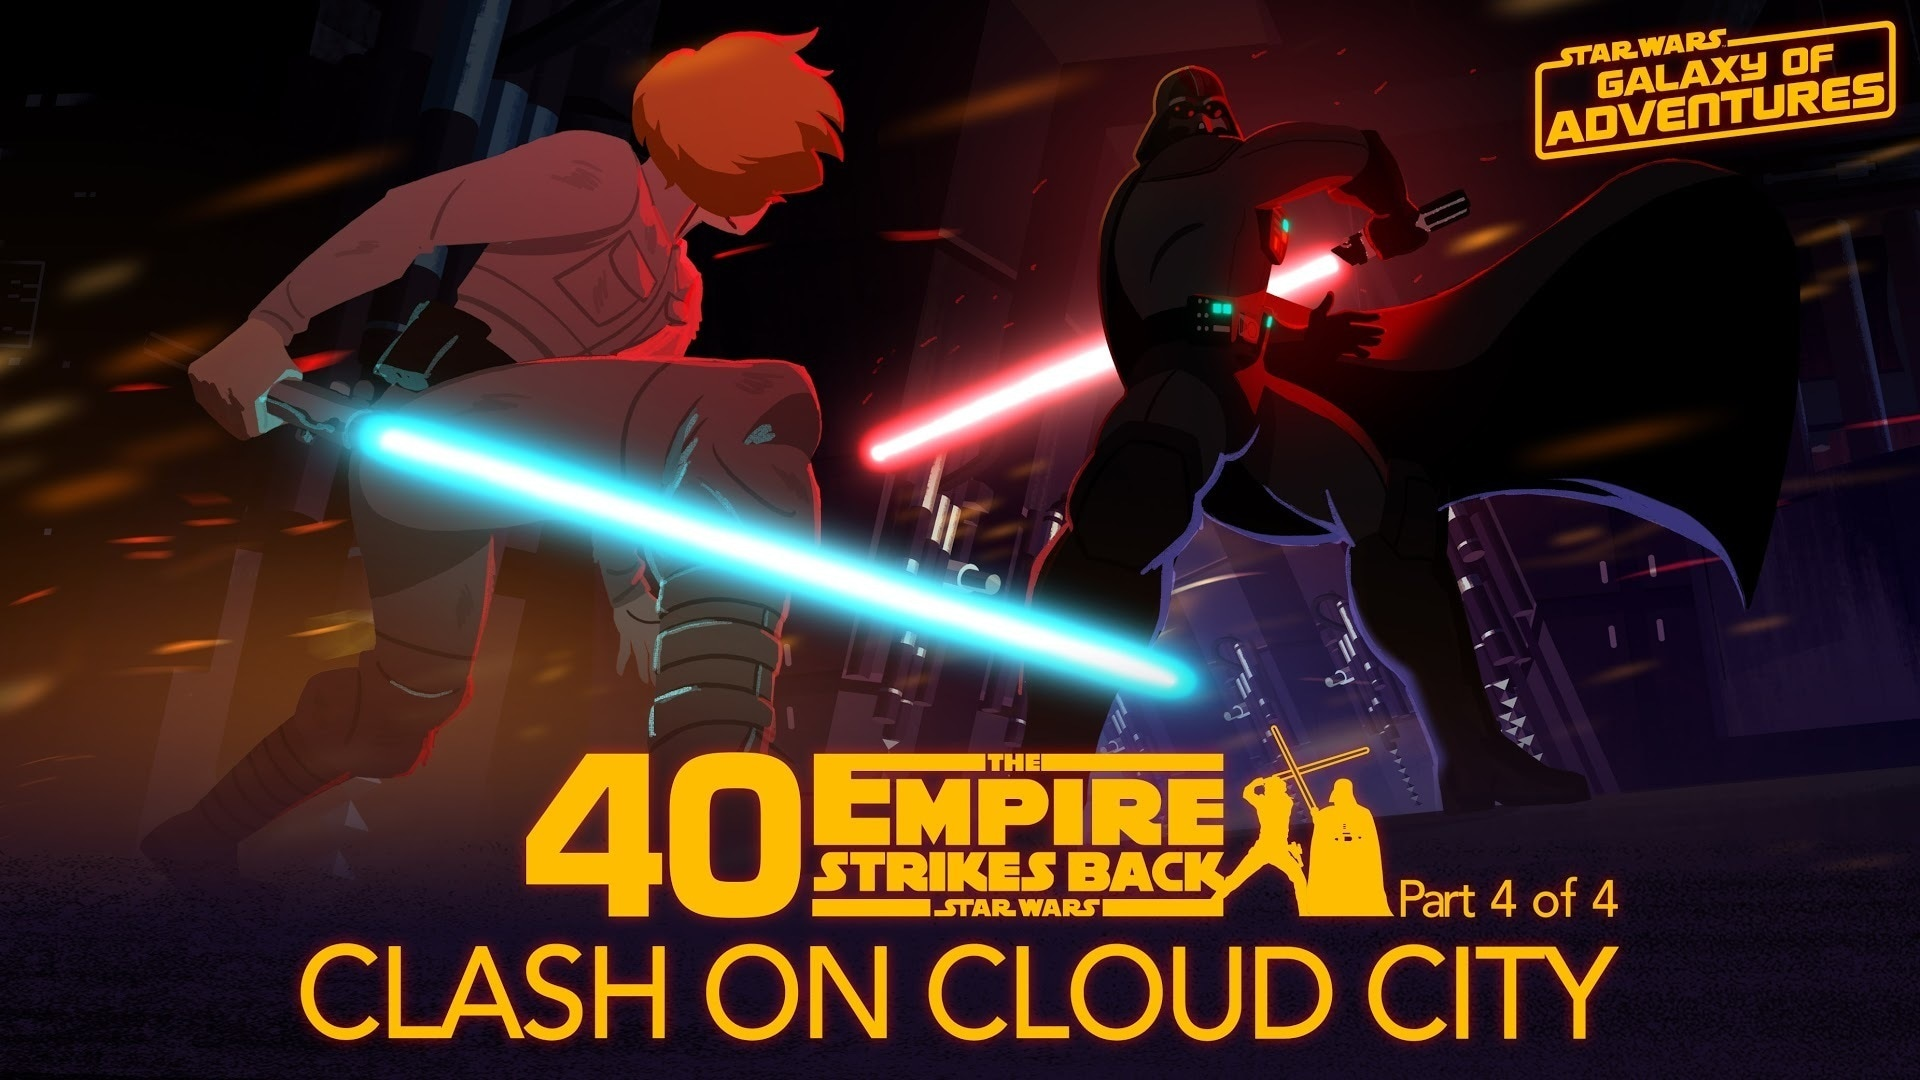 Clash on Cloud City | Star Wars Galaxy of Adventures